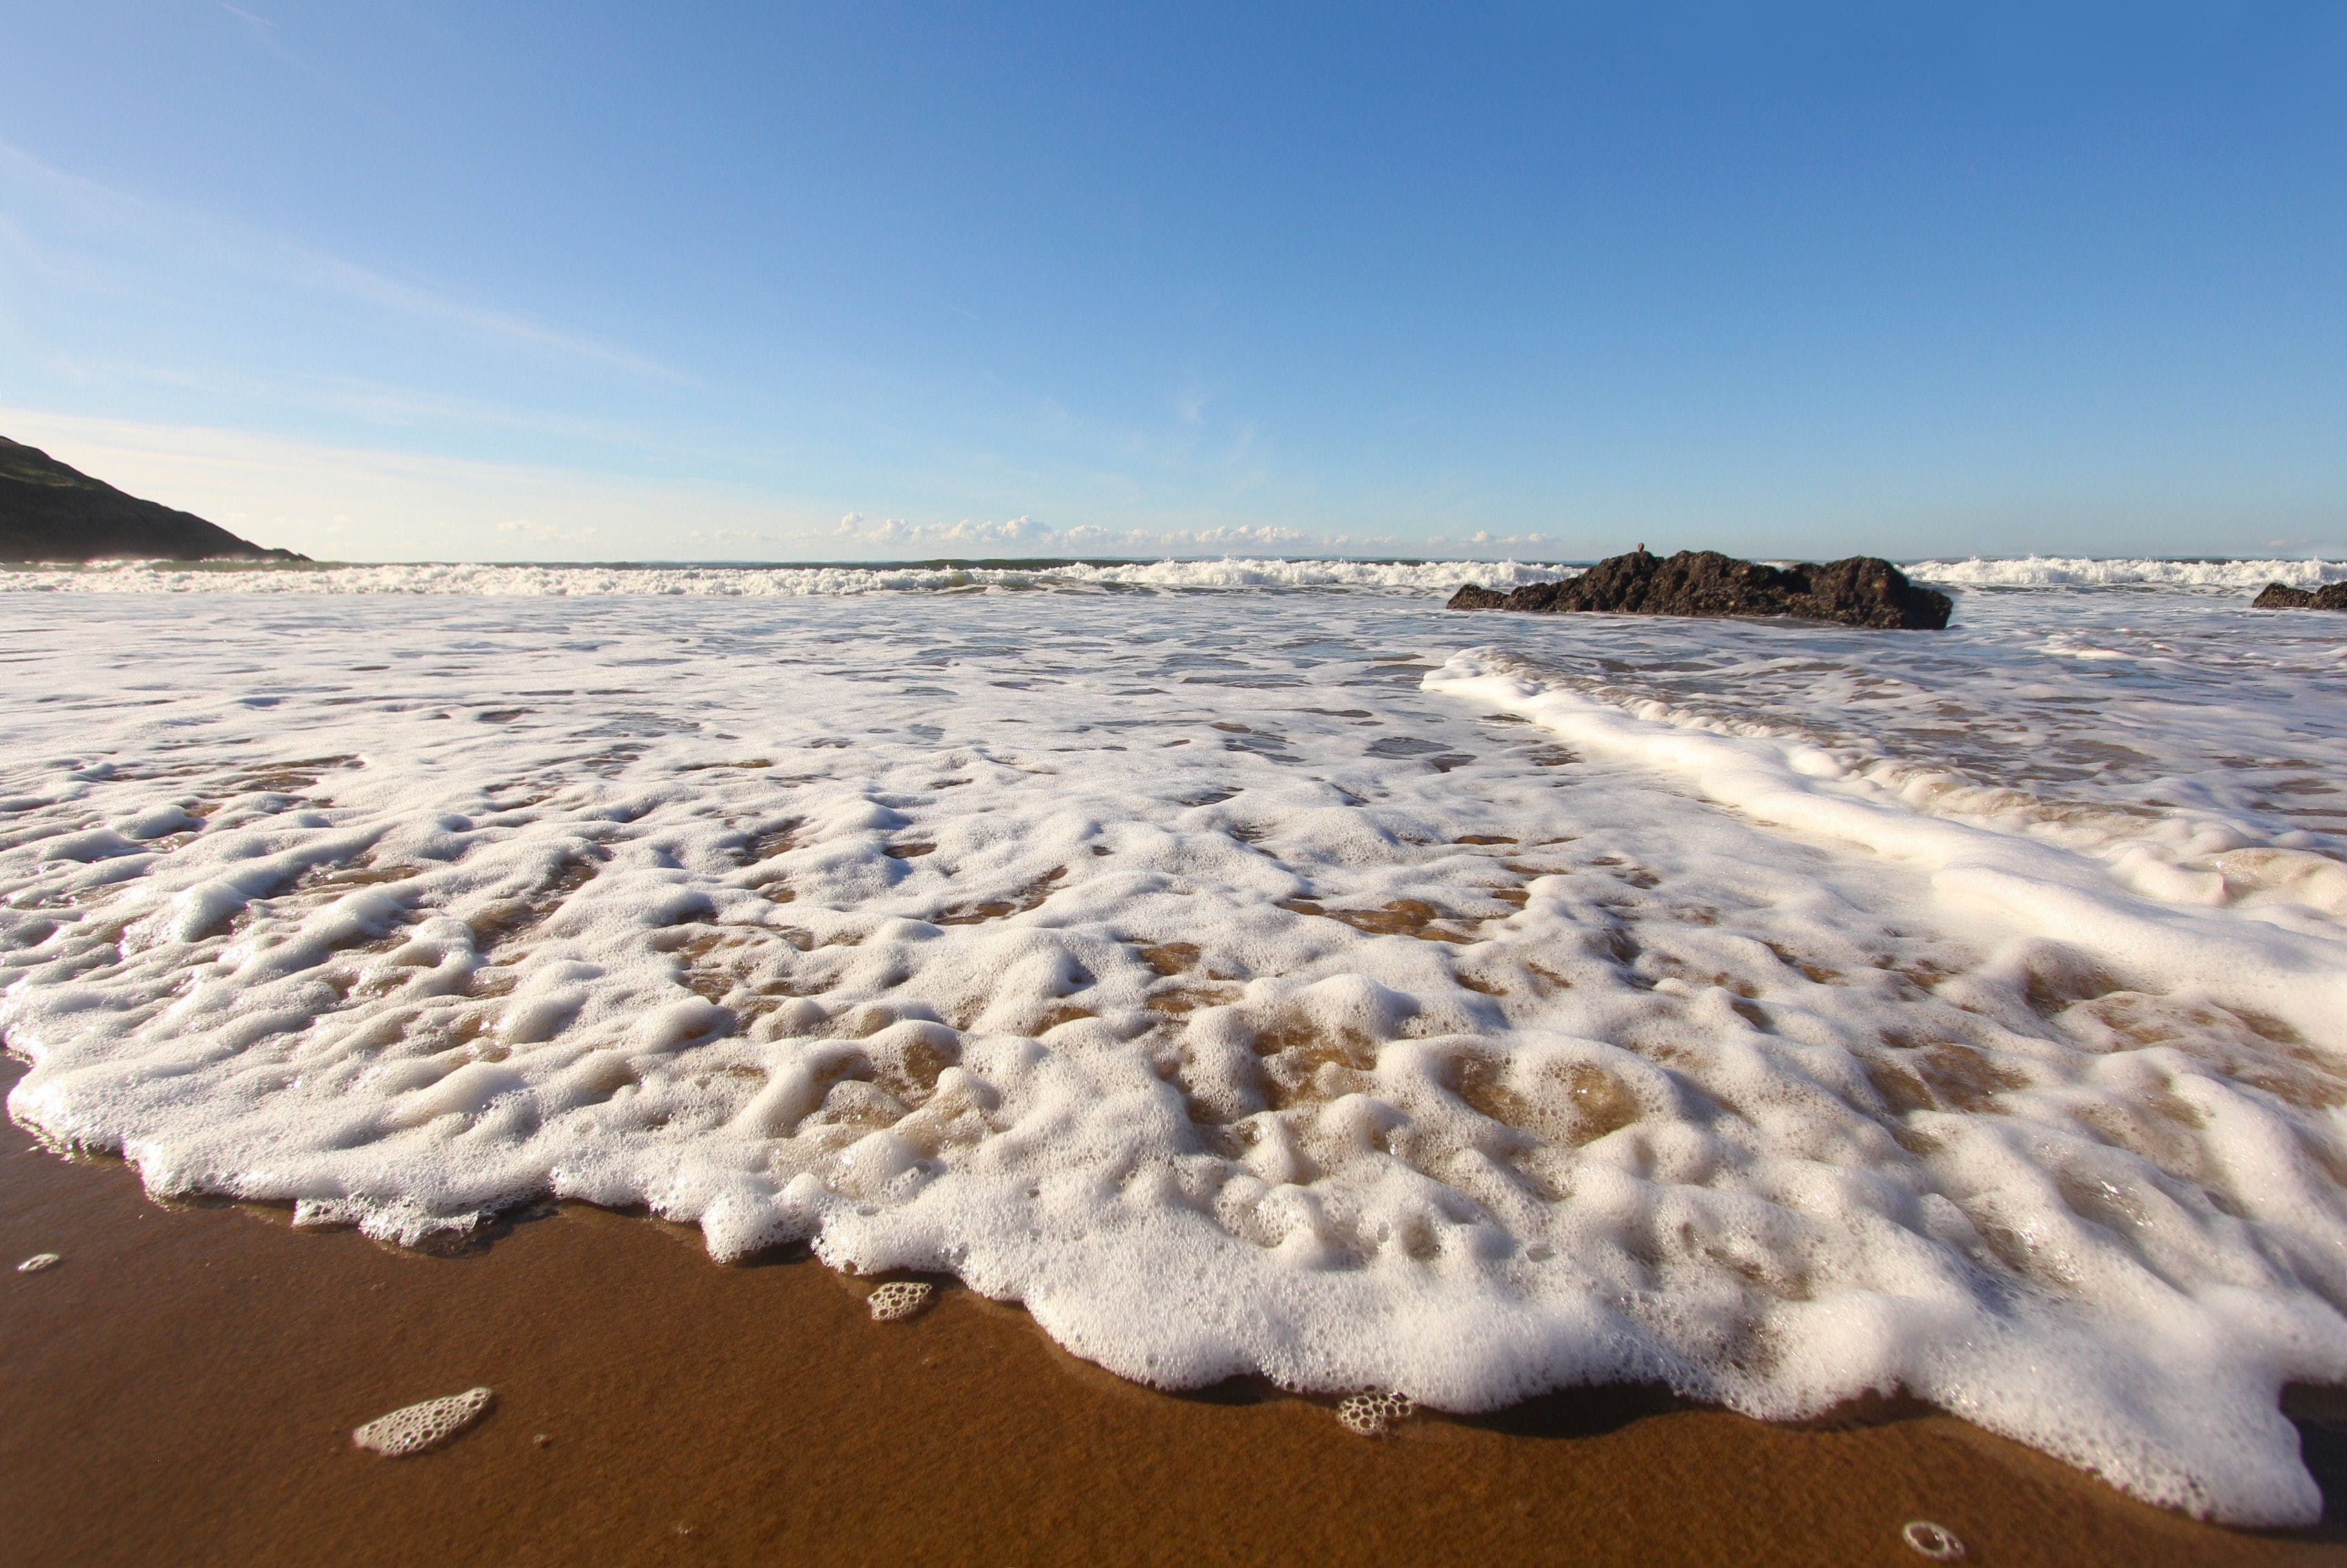 Free stock photo of beach, ocean, coast, Wales